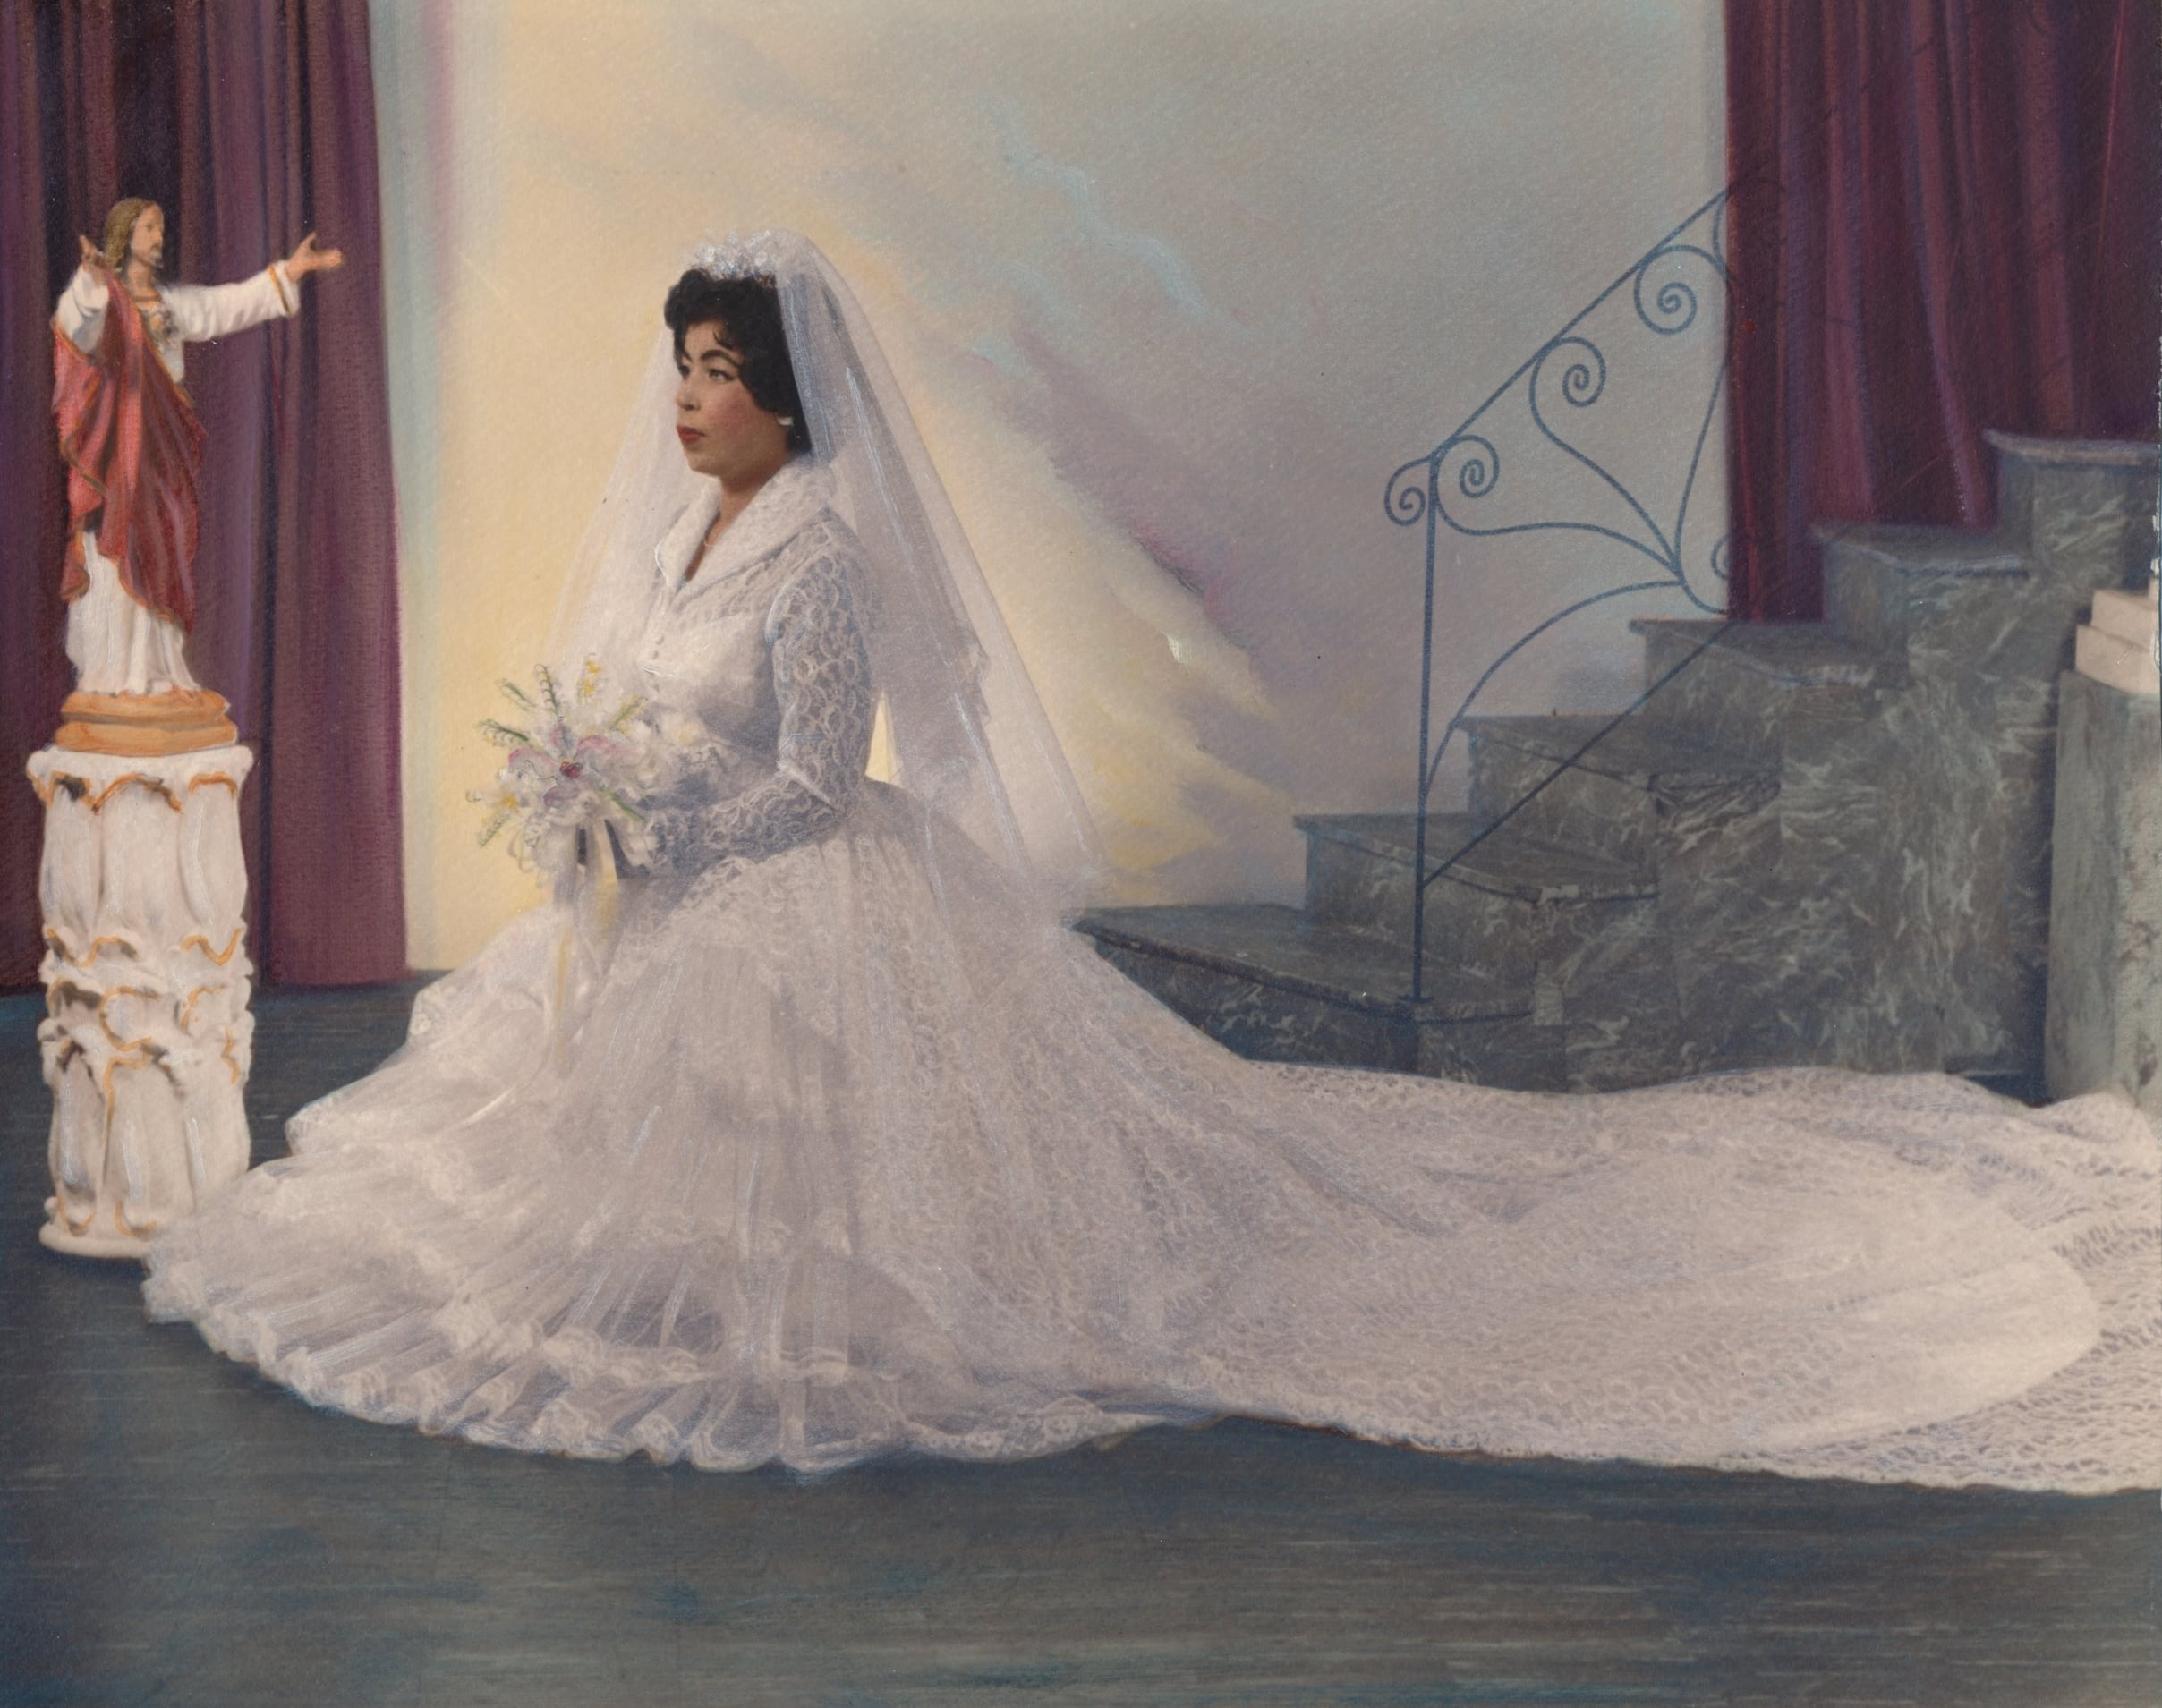 Maria Hurtado wedding photo